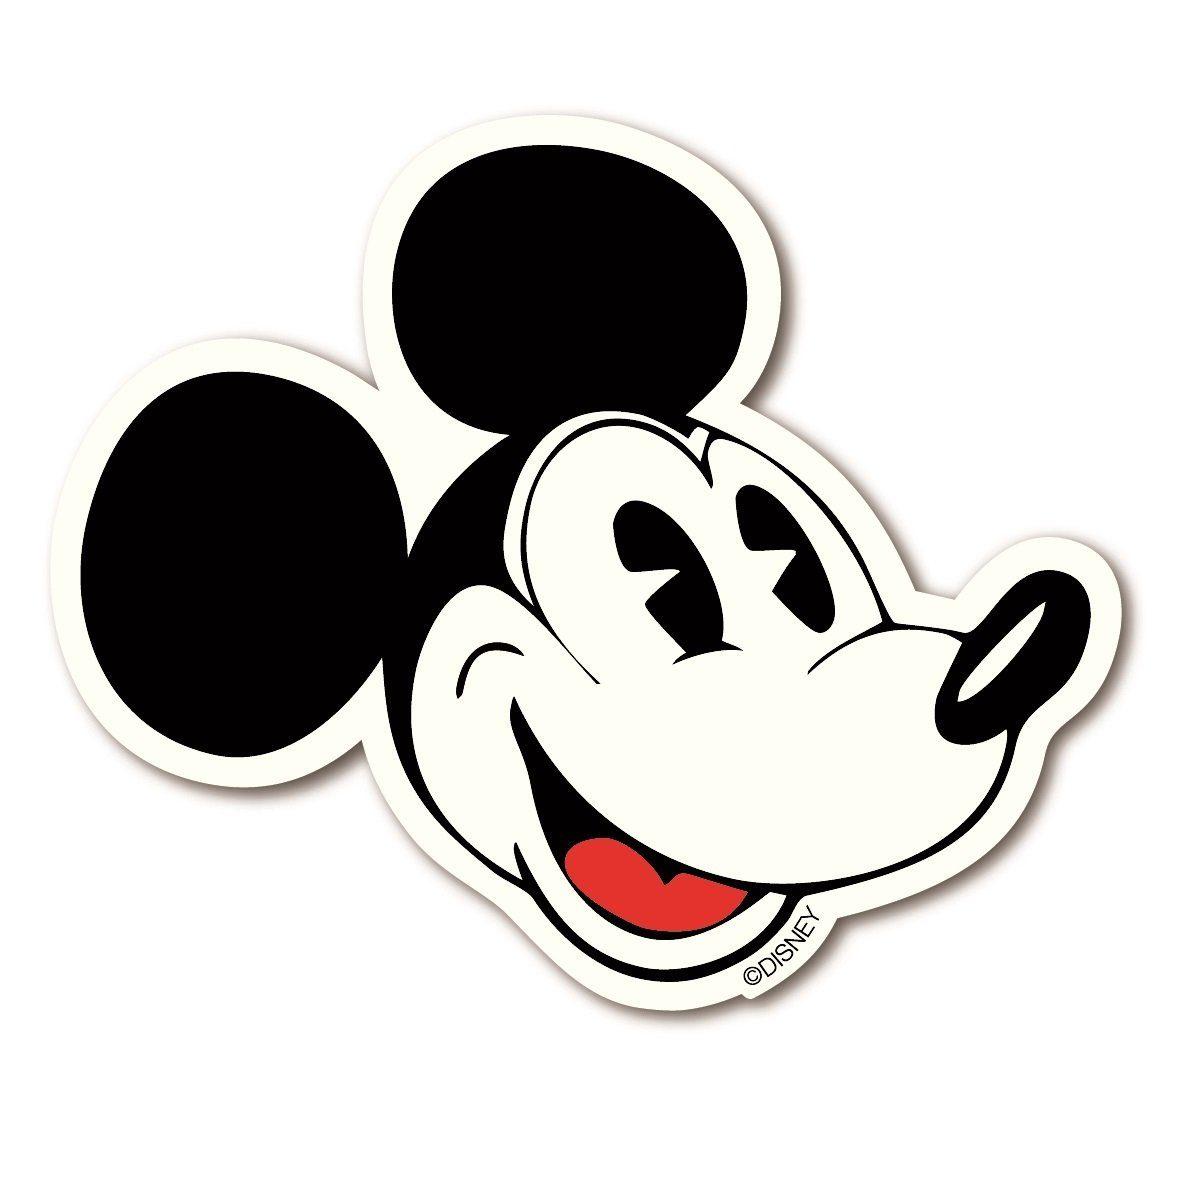 LOGOSHIRT Magnet mit klassischer Mickey Mouse-Silhouette